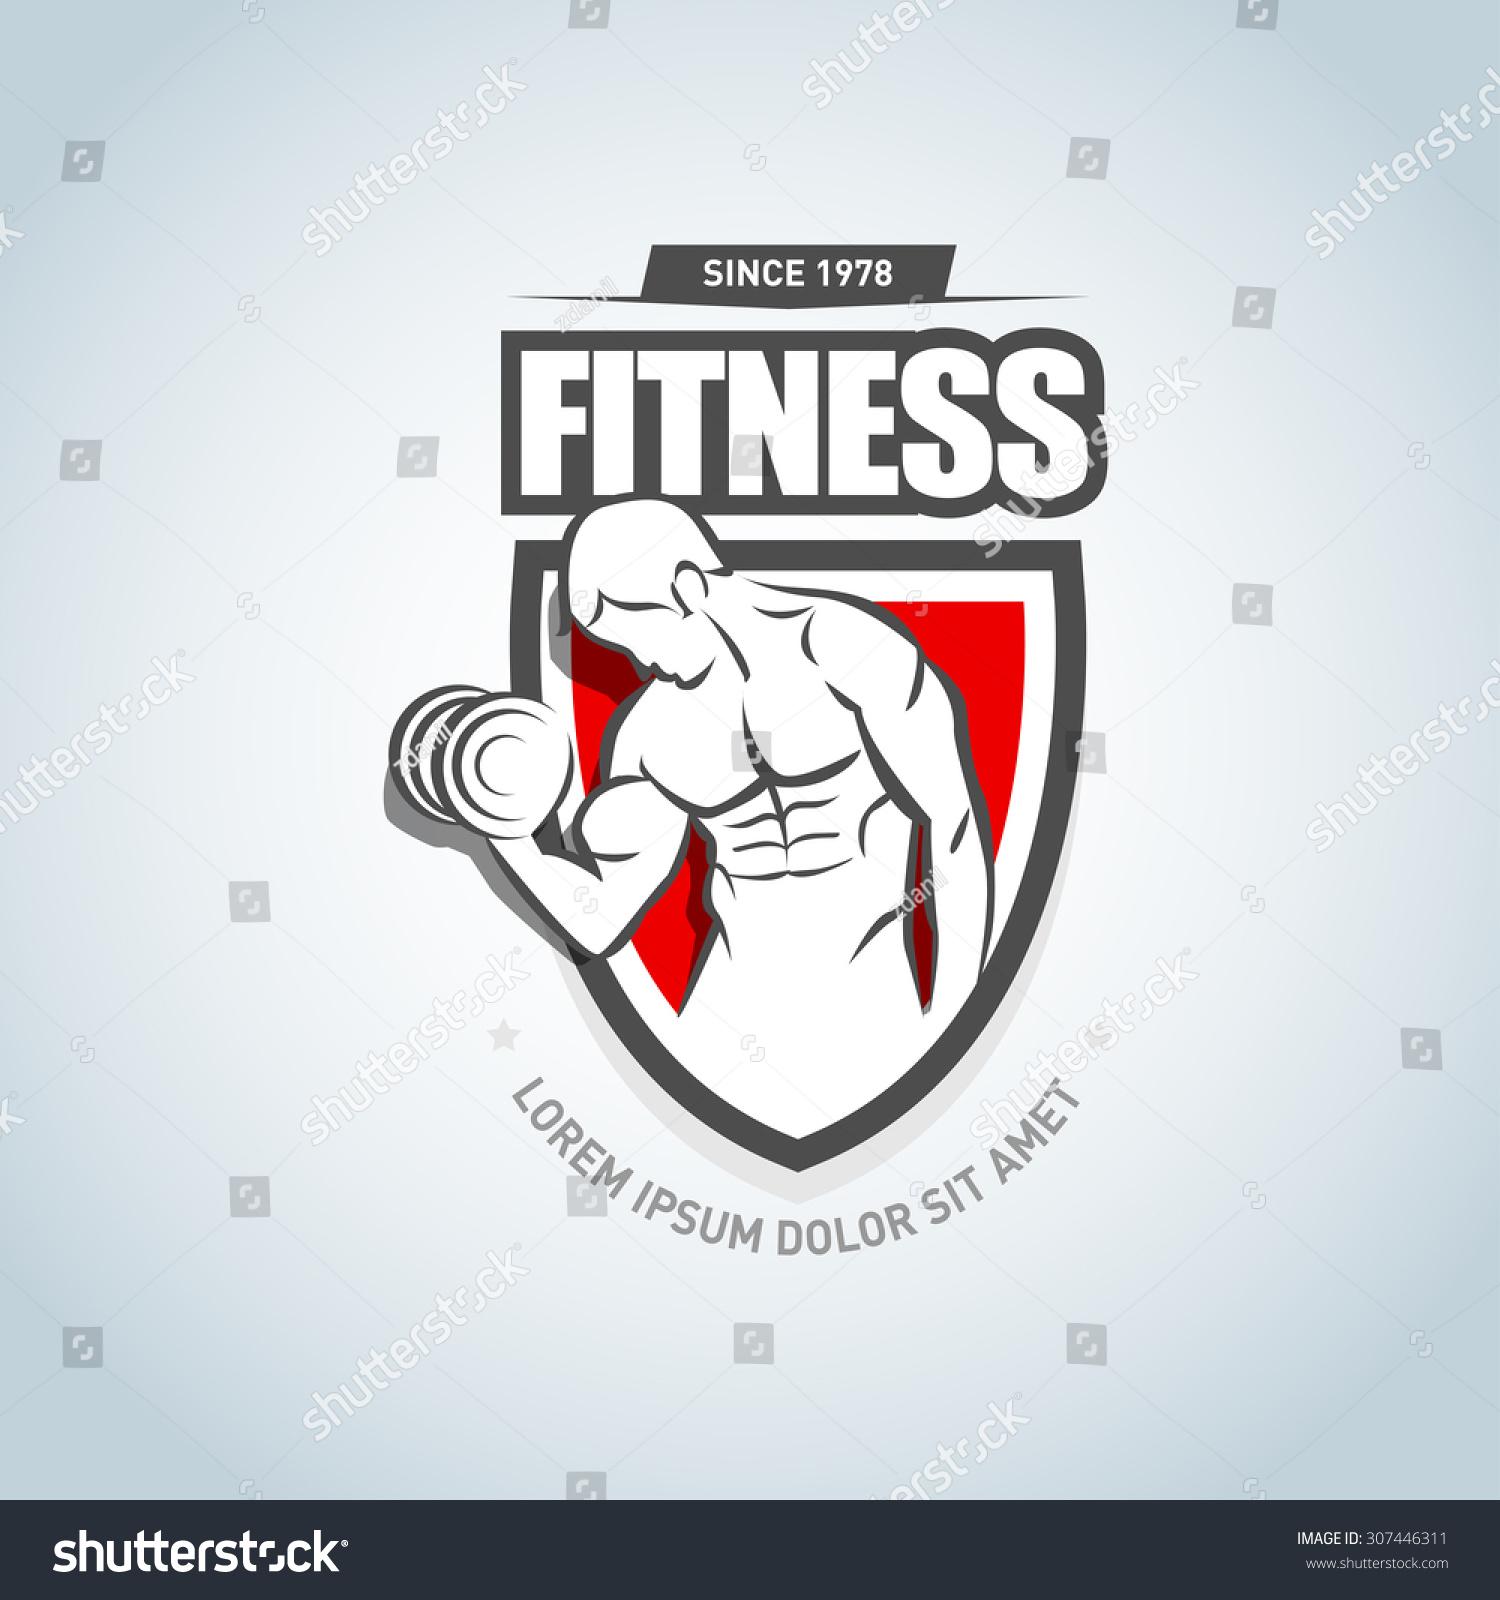 ... logo design template. Sport Fitness club creative concept. Bodybuilder